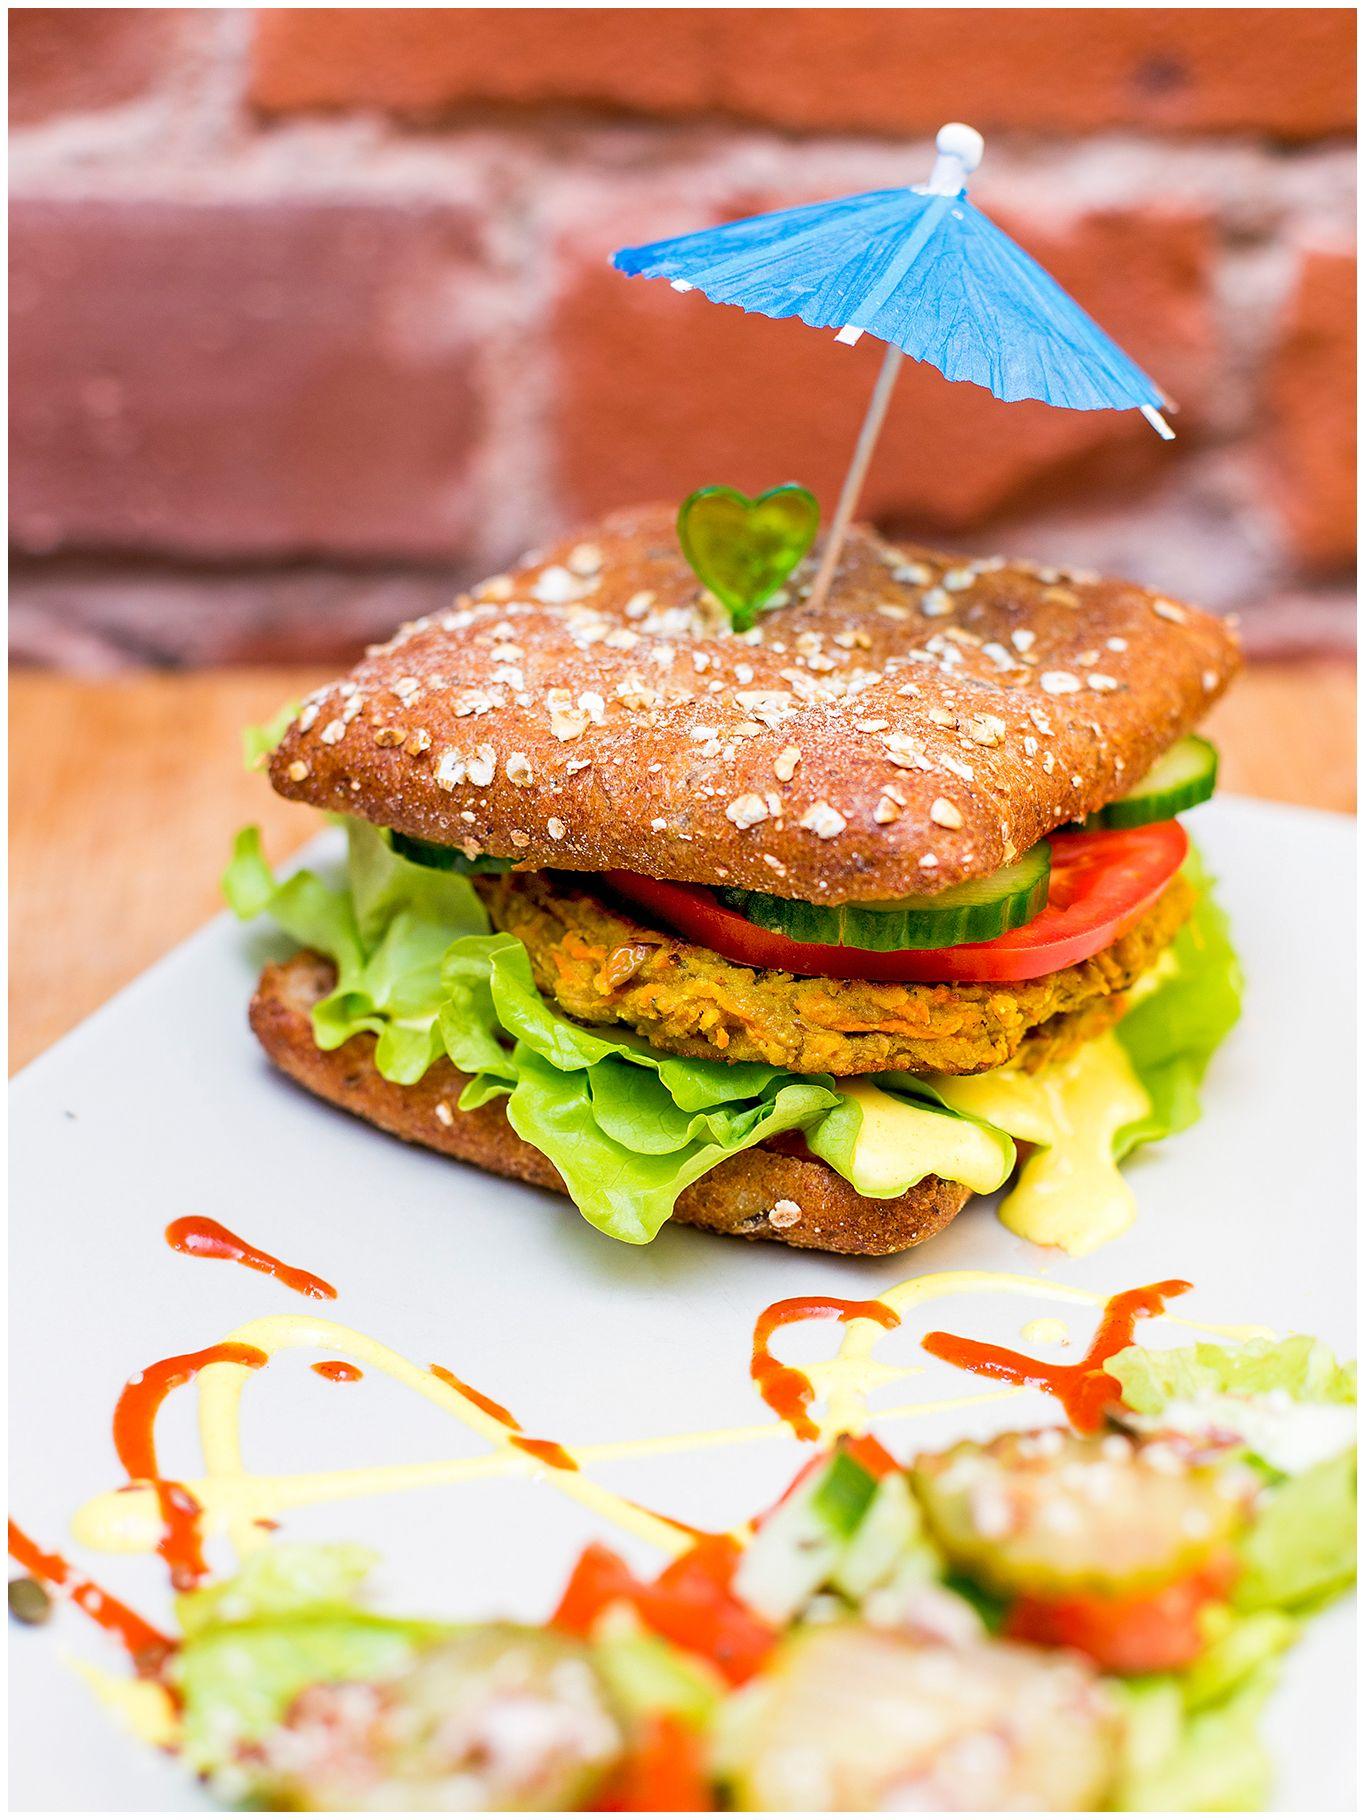 Veggie Burger Vegan Restaurants Health Food Food